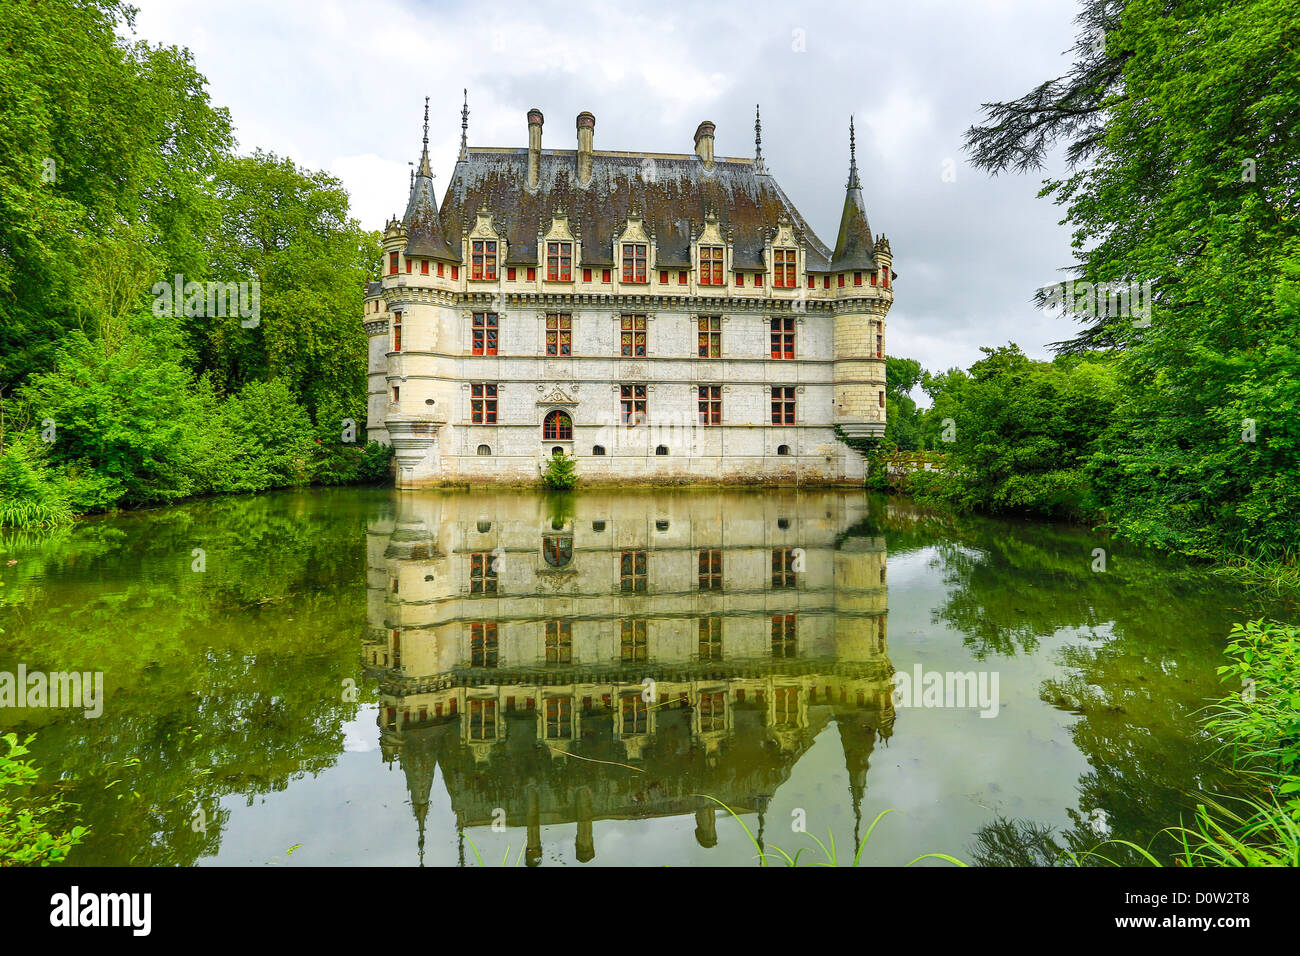 France, Europe, travel, Loire Valley, Azay le Rideau, architecture, castle, cloudy, history, Loire, medieval, pond, - Stock Image